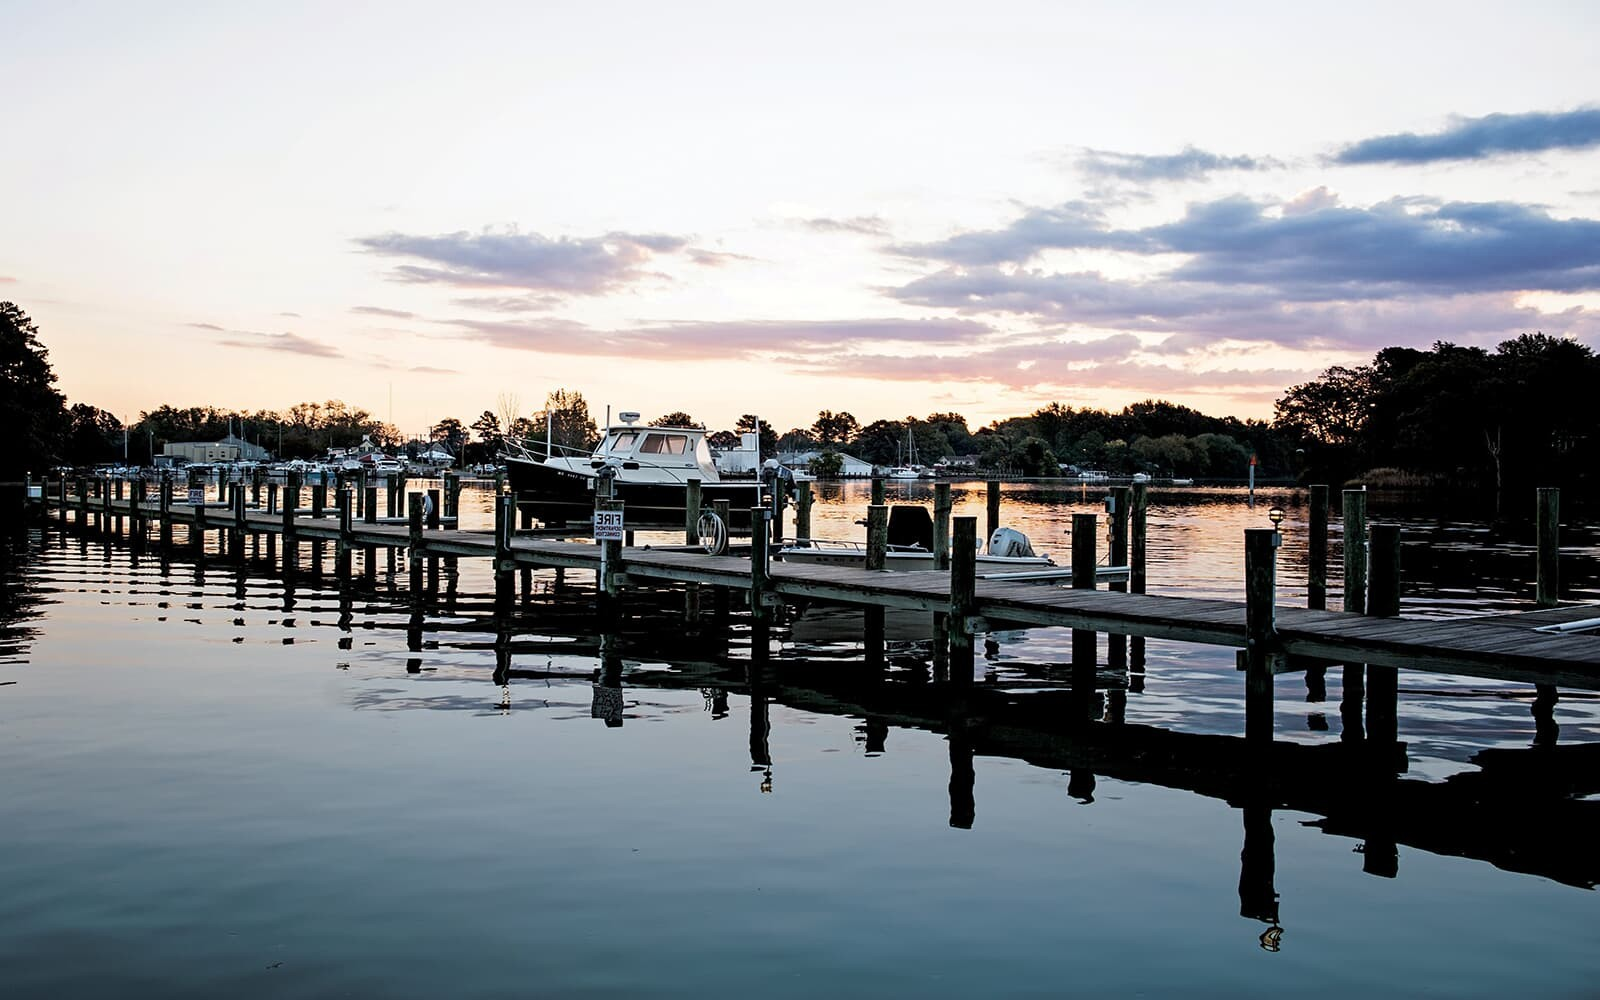 boat-slips-easton-md-easton-village-brookfield-residential.jpg